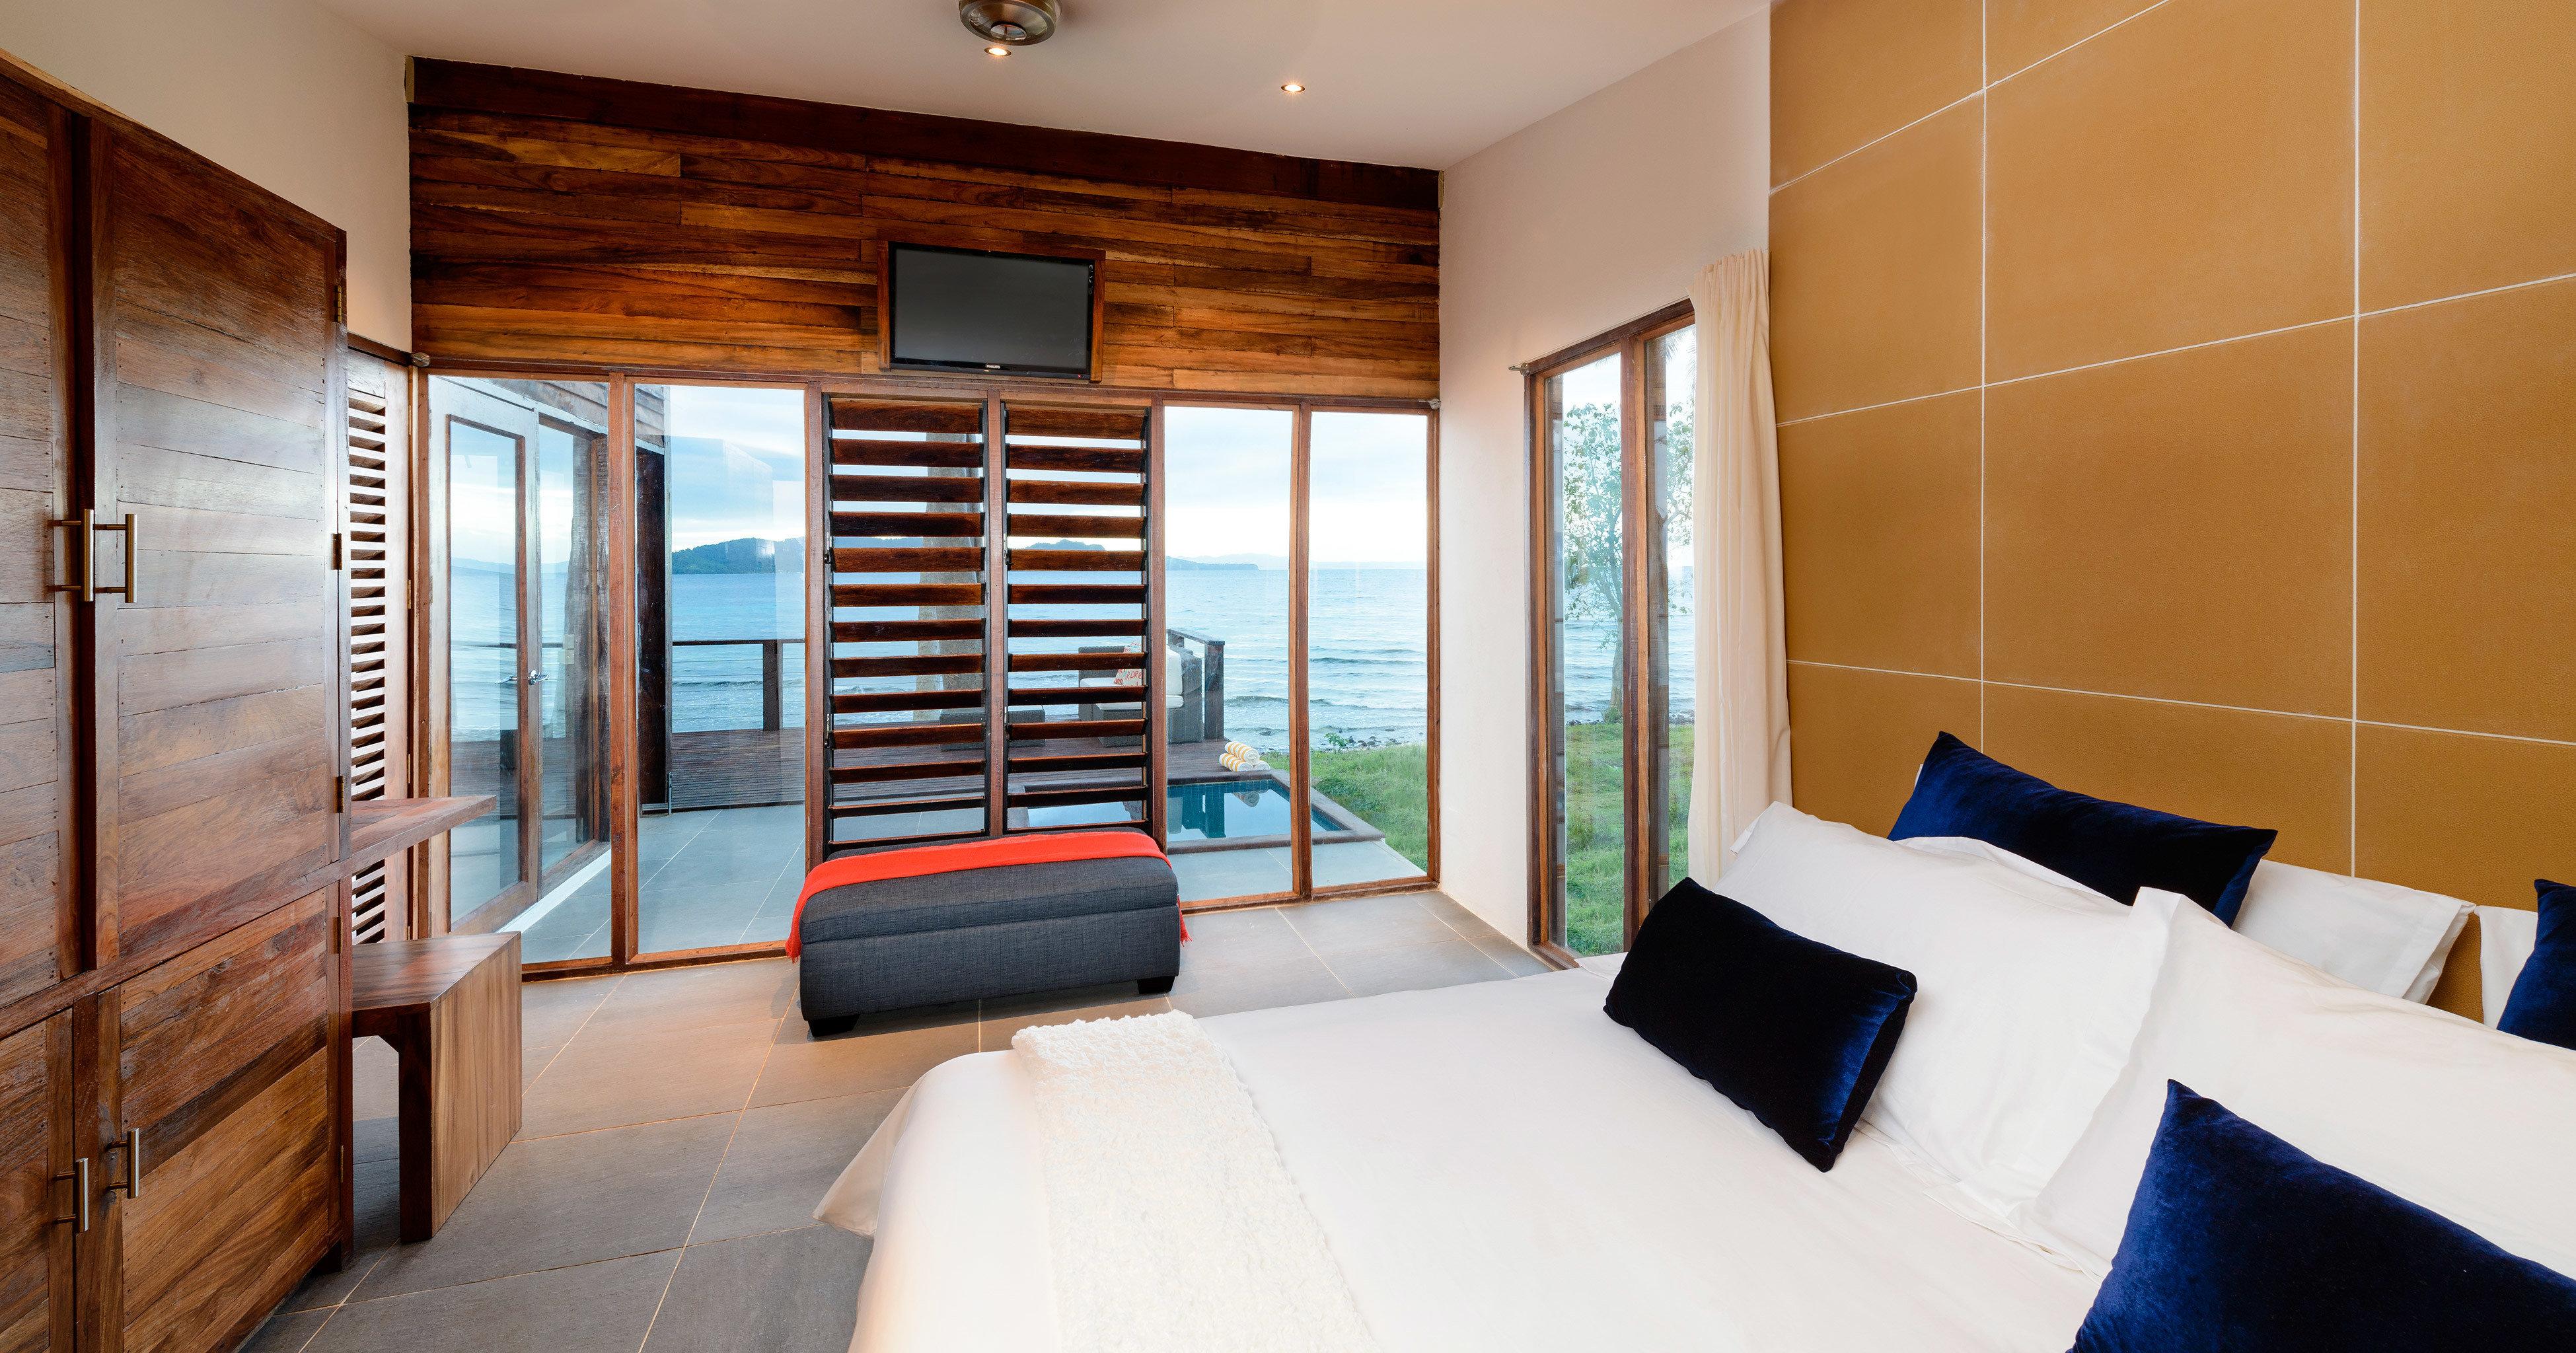 Bedroom Classic Luxury Resort property house Suite home condominium cottage Modern